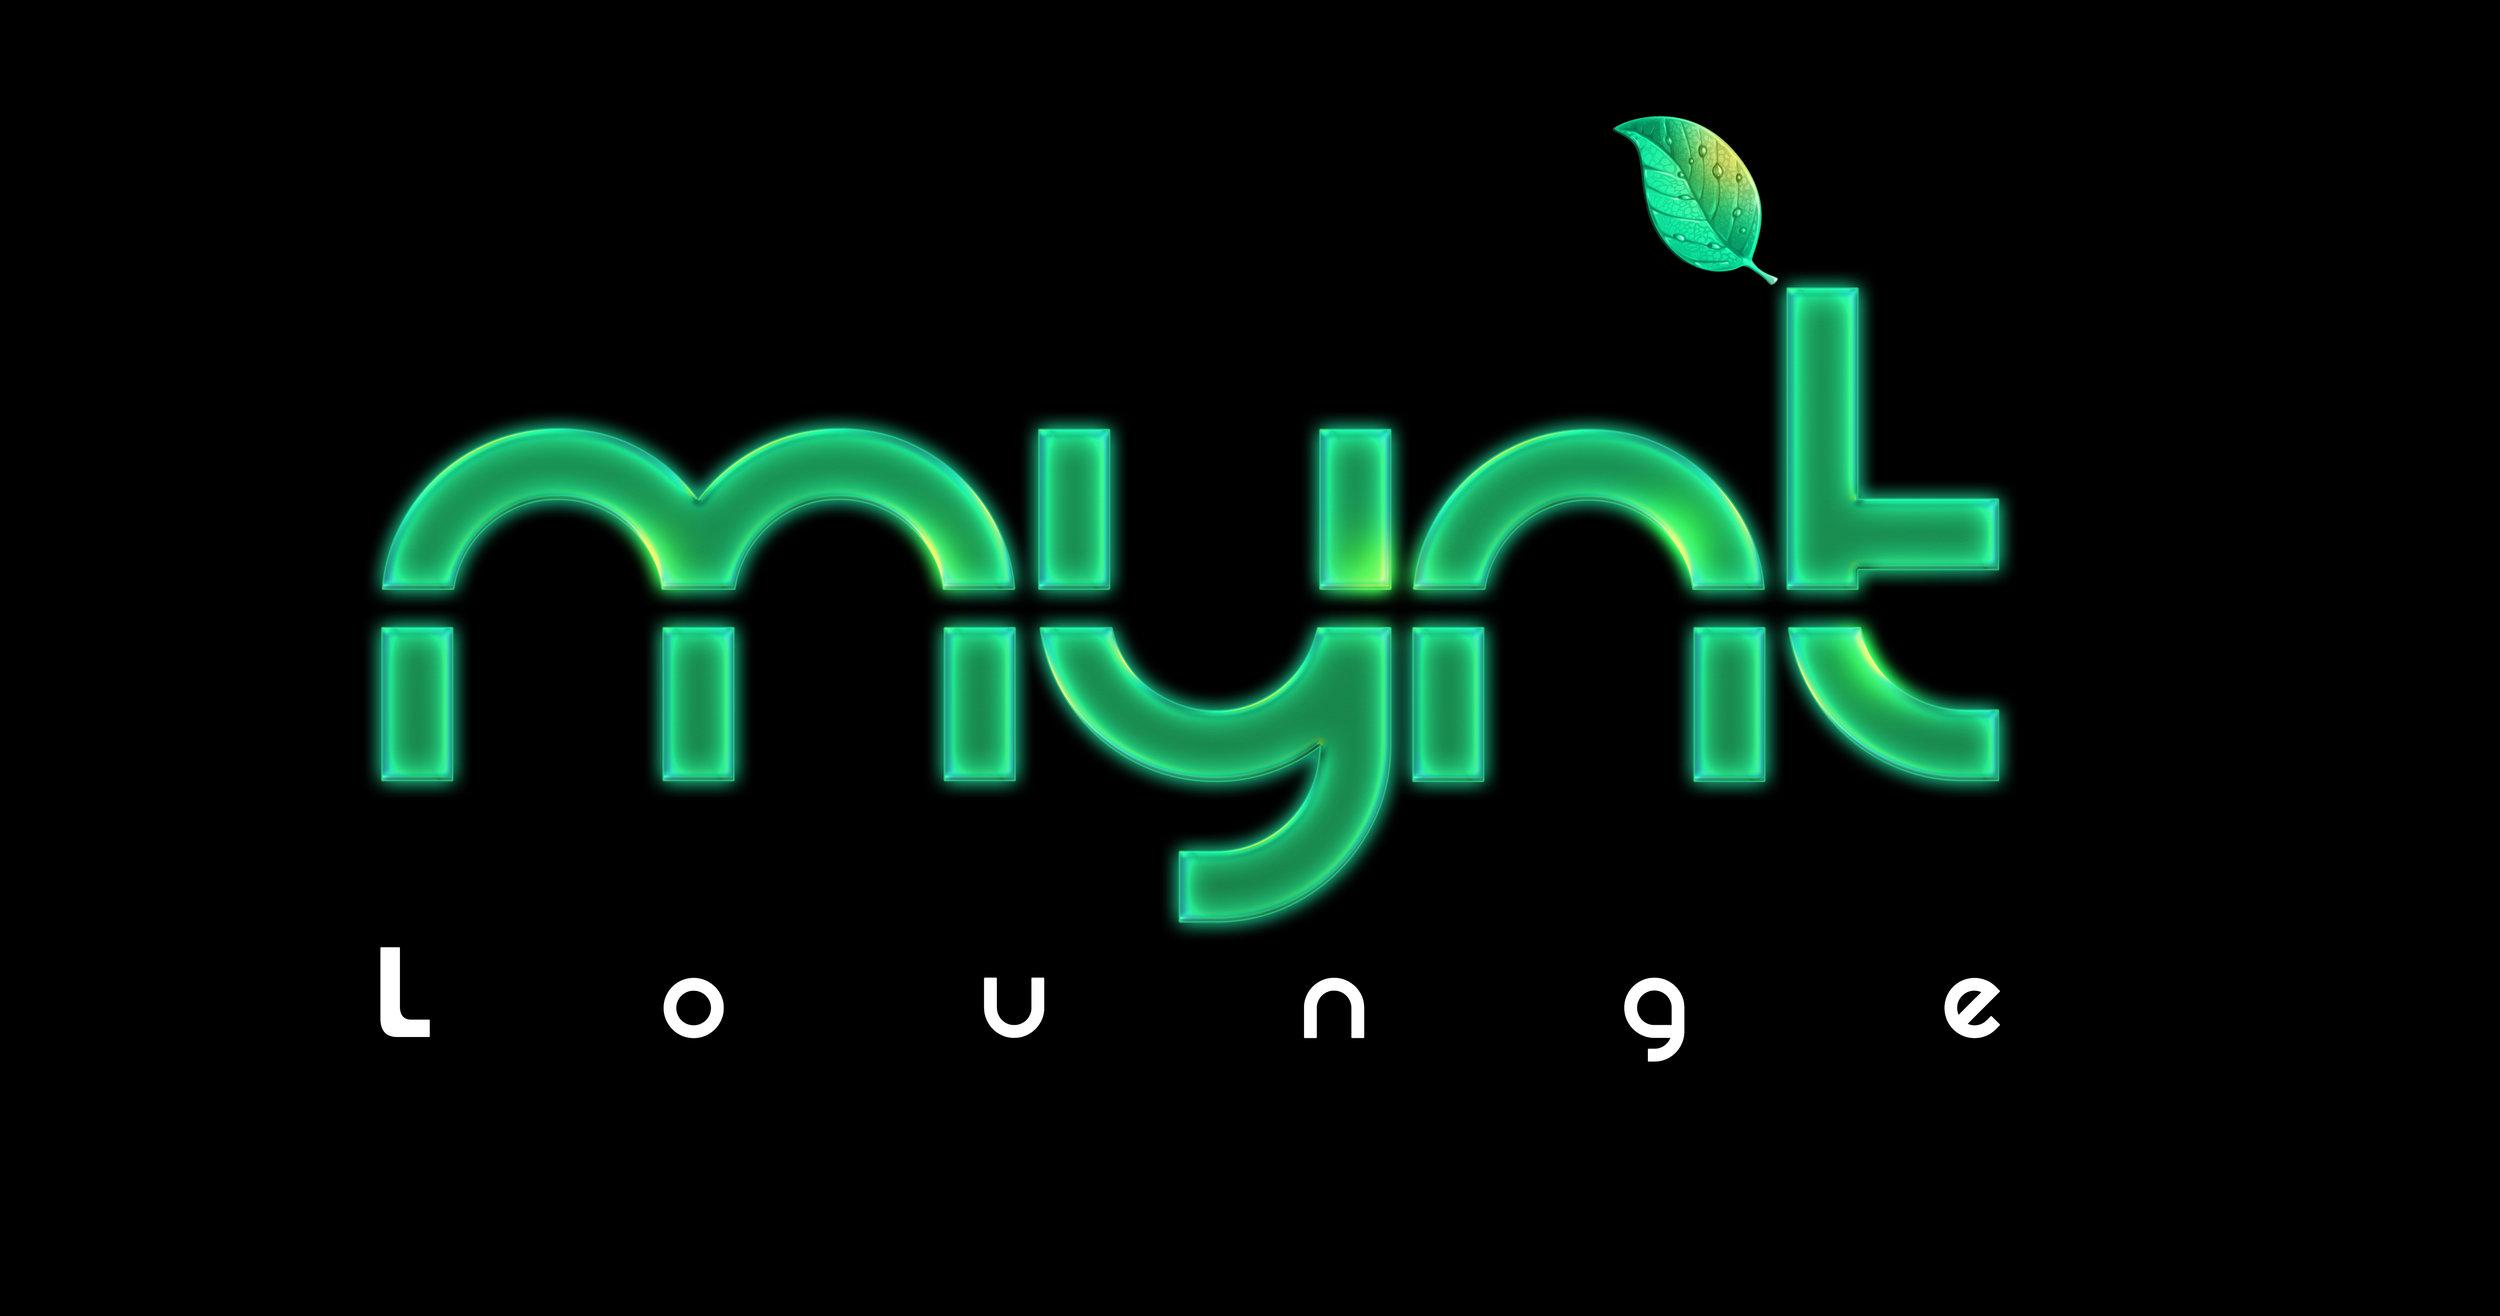 Q_mynt_logo_idea_.jpg